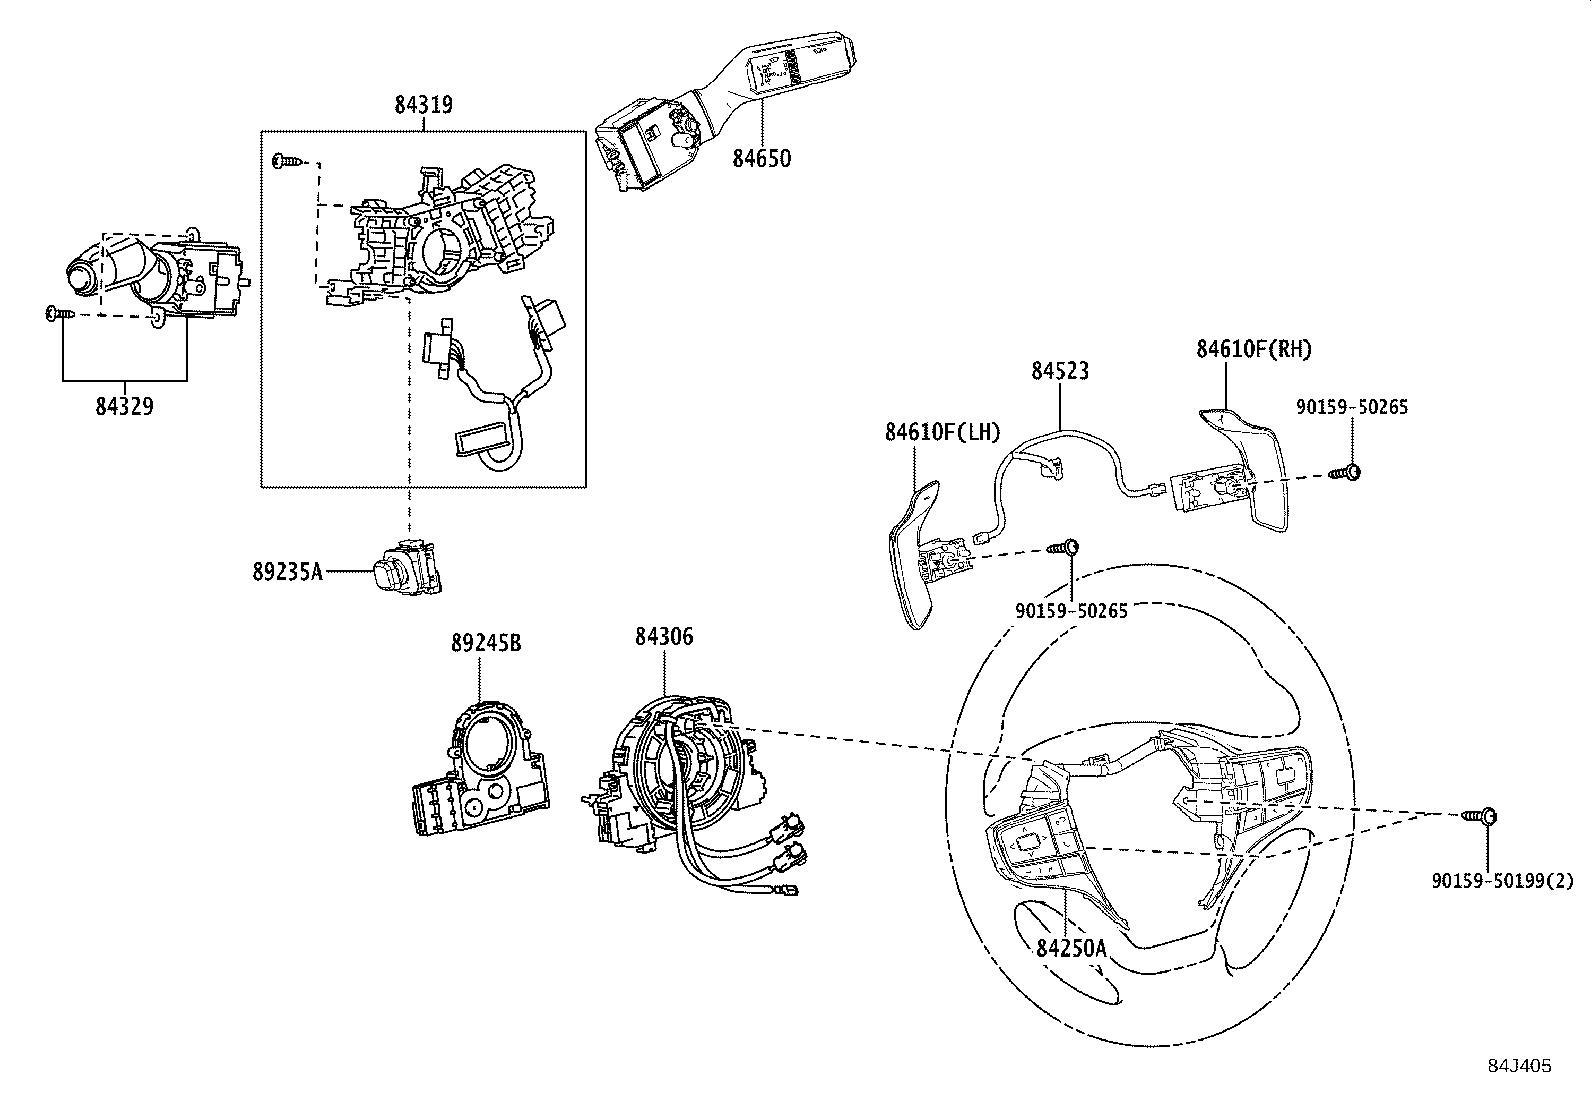 Lexus Ux 200 Blind Spot Detection System Warning Sensor